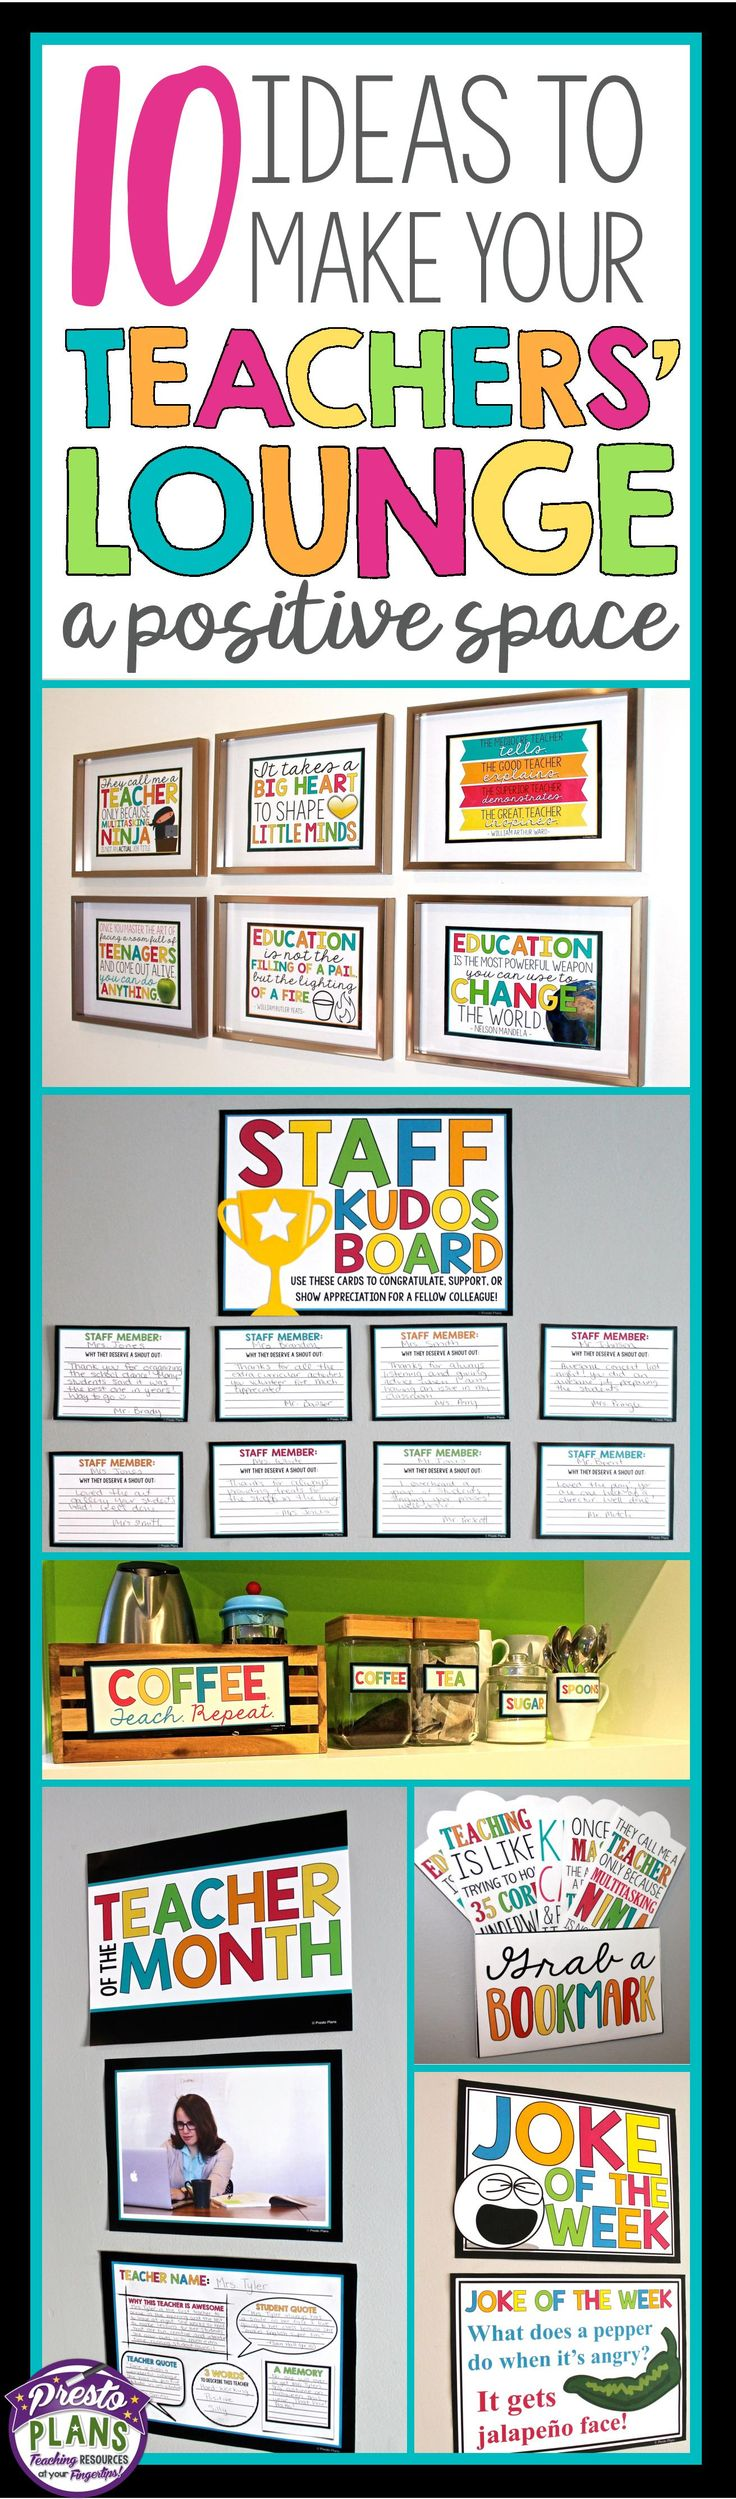 Teacher's Lounge needs a positive upgrade!